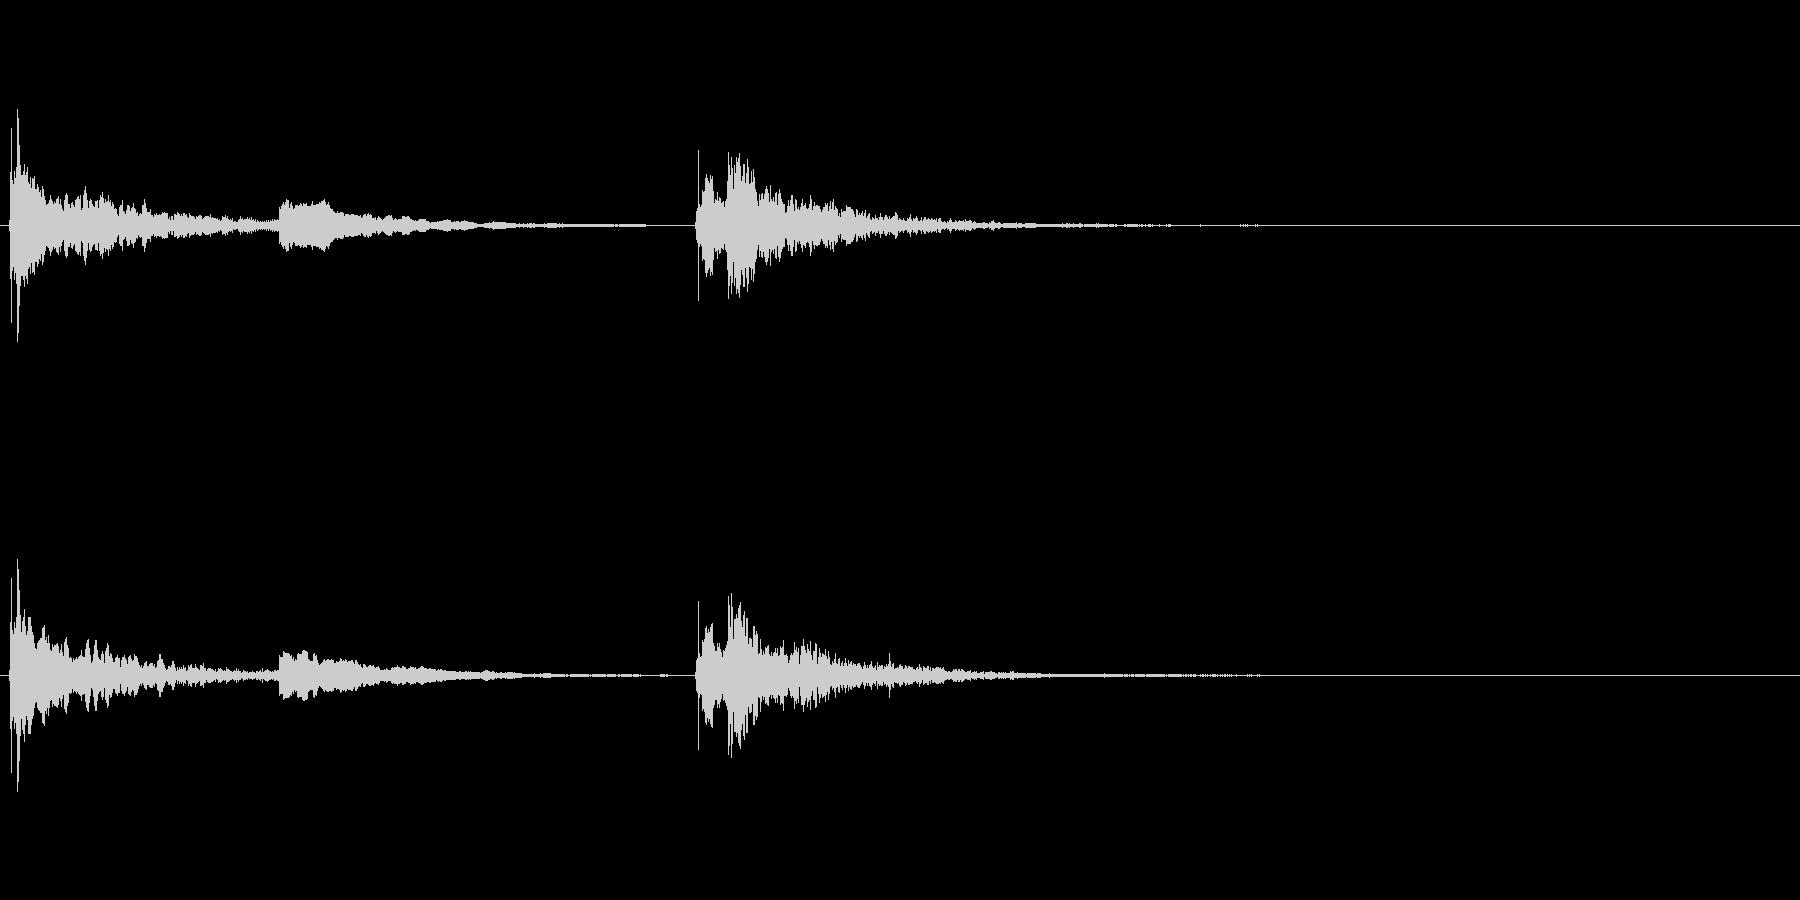 生演奏 琵琶 和風 古典風 残響有#6の未再生の波形